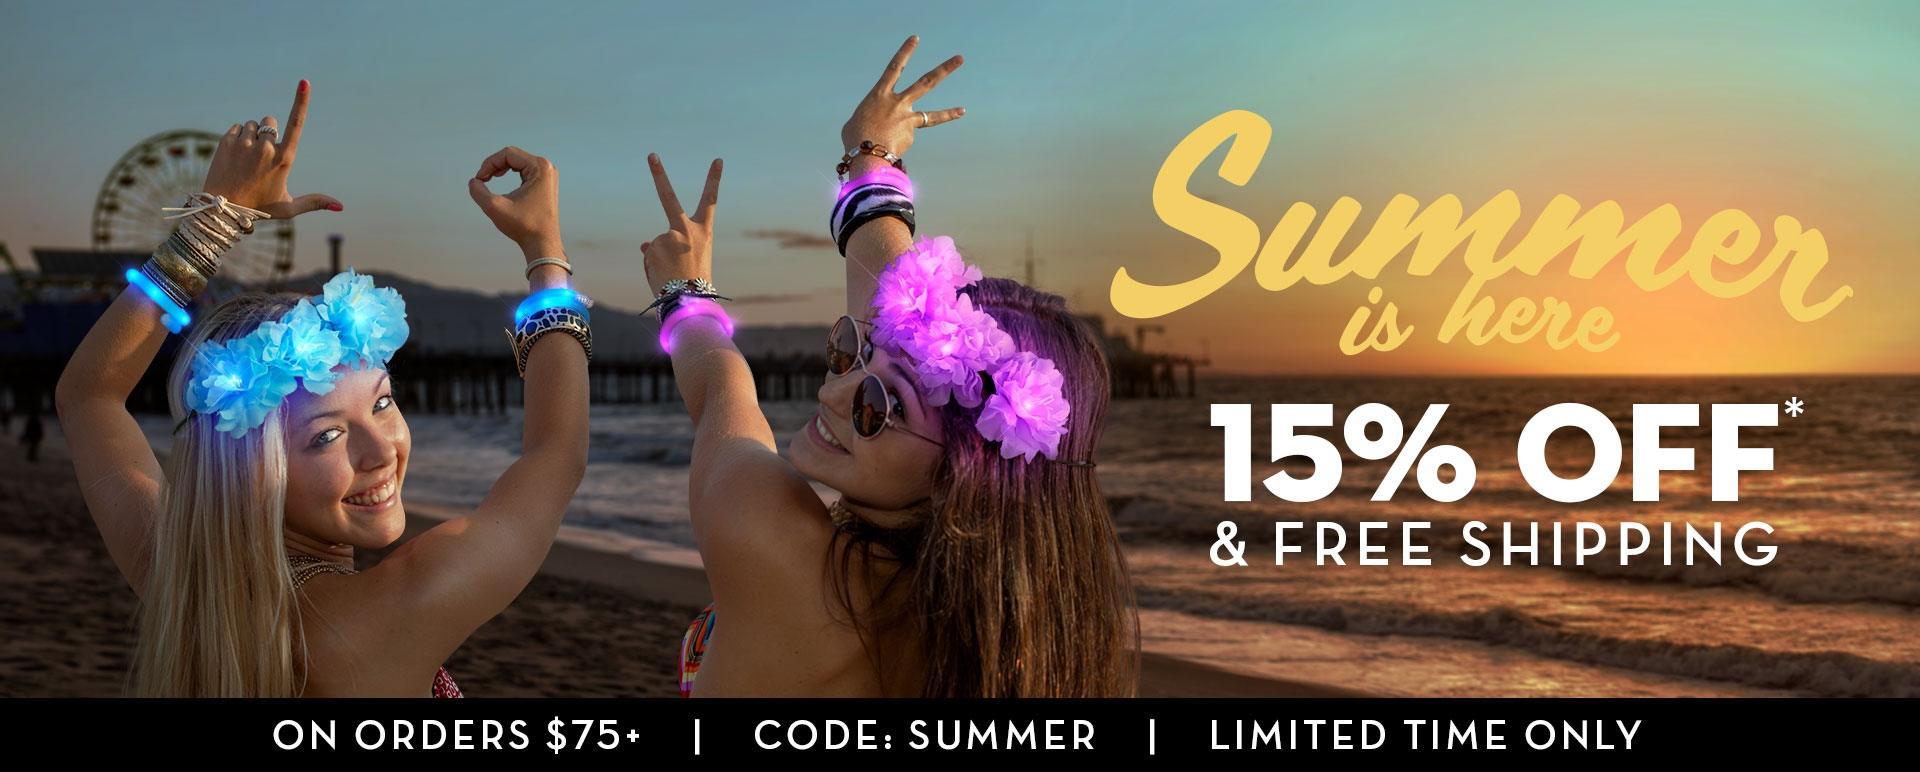 Summer Fun Sale 15% OFF